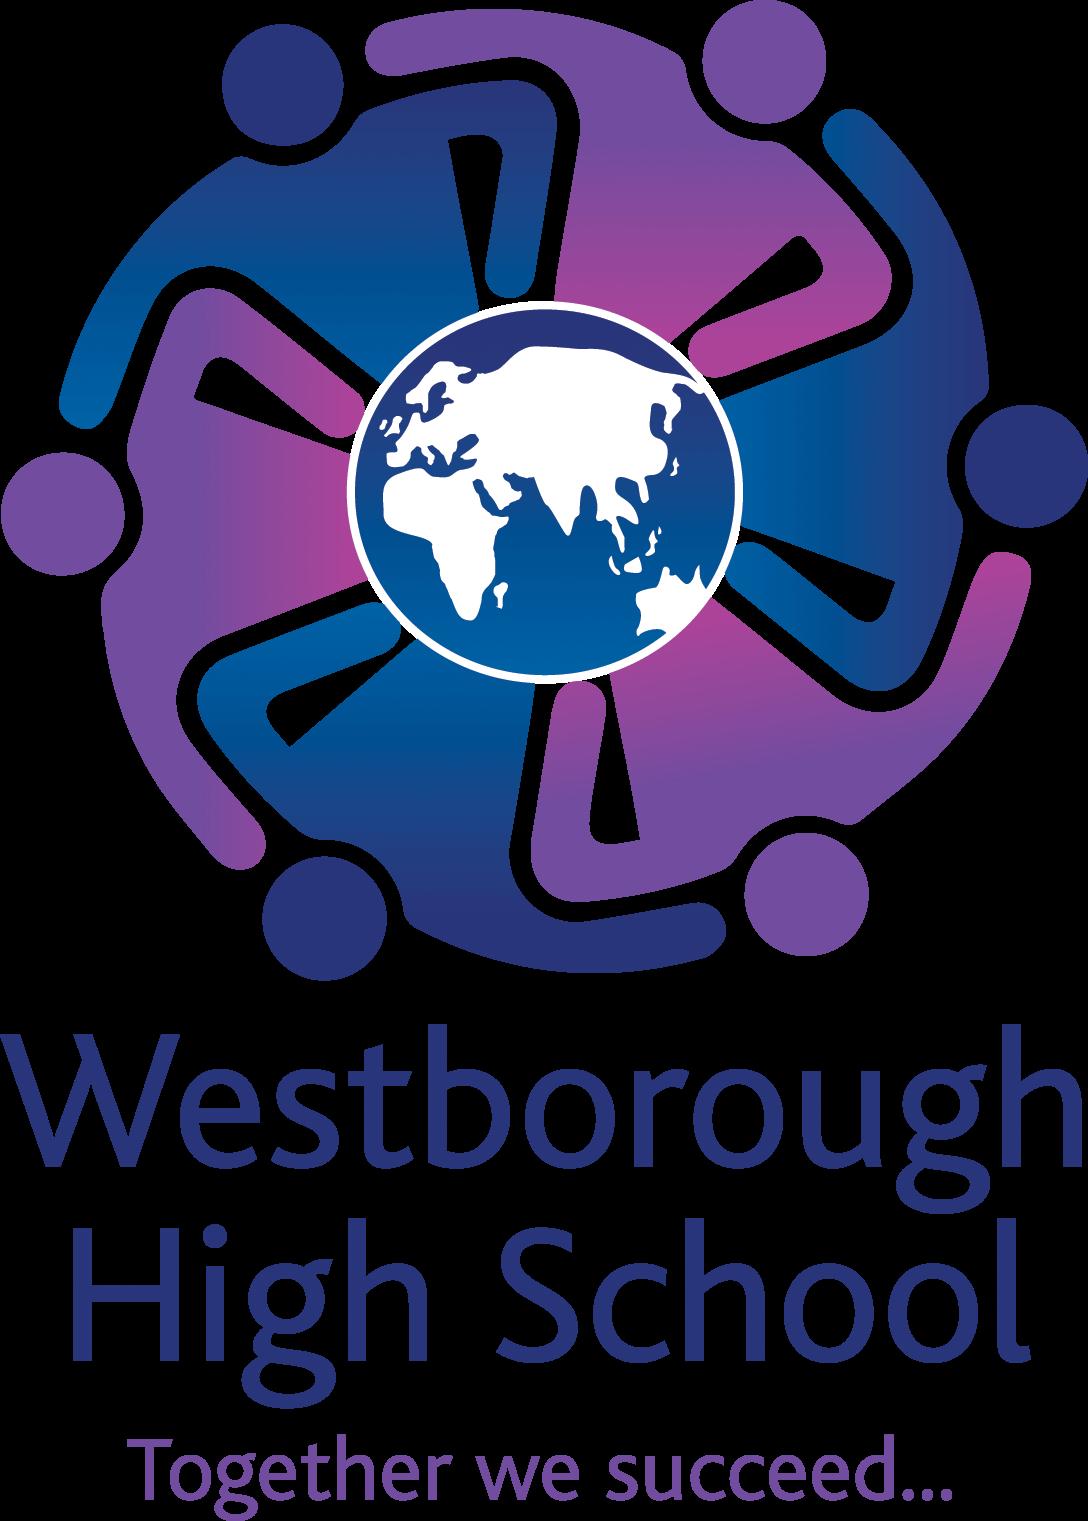 WESTBOROUGH HIGH SCHOOL Gradient LOGO